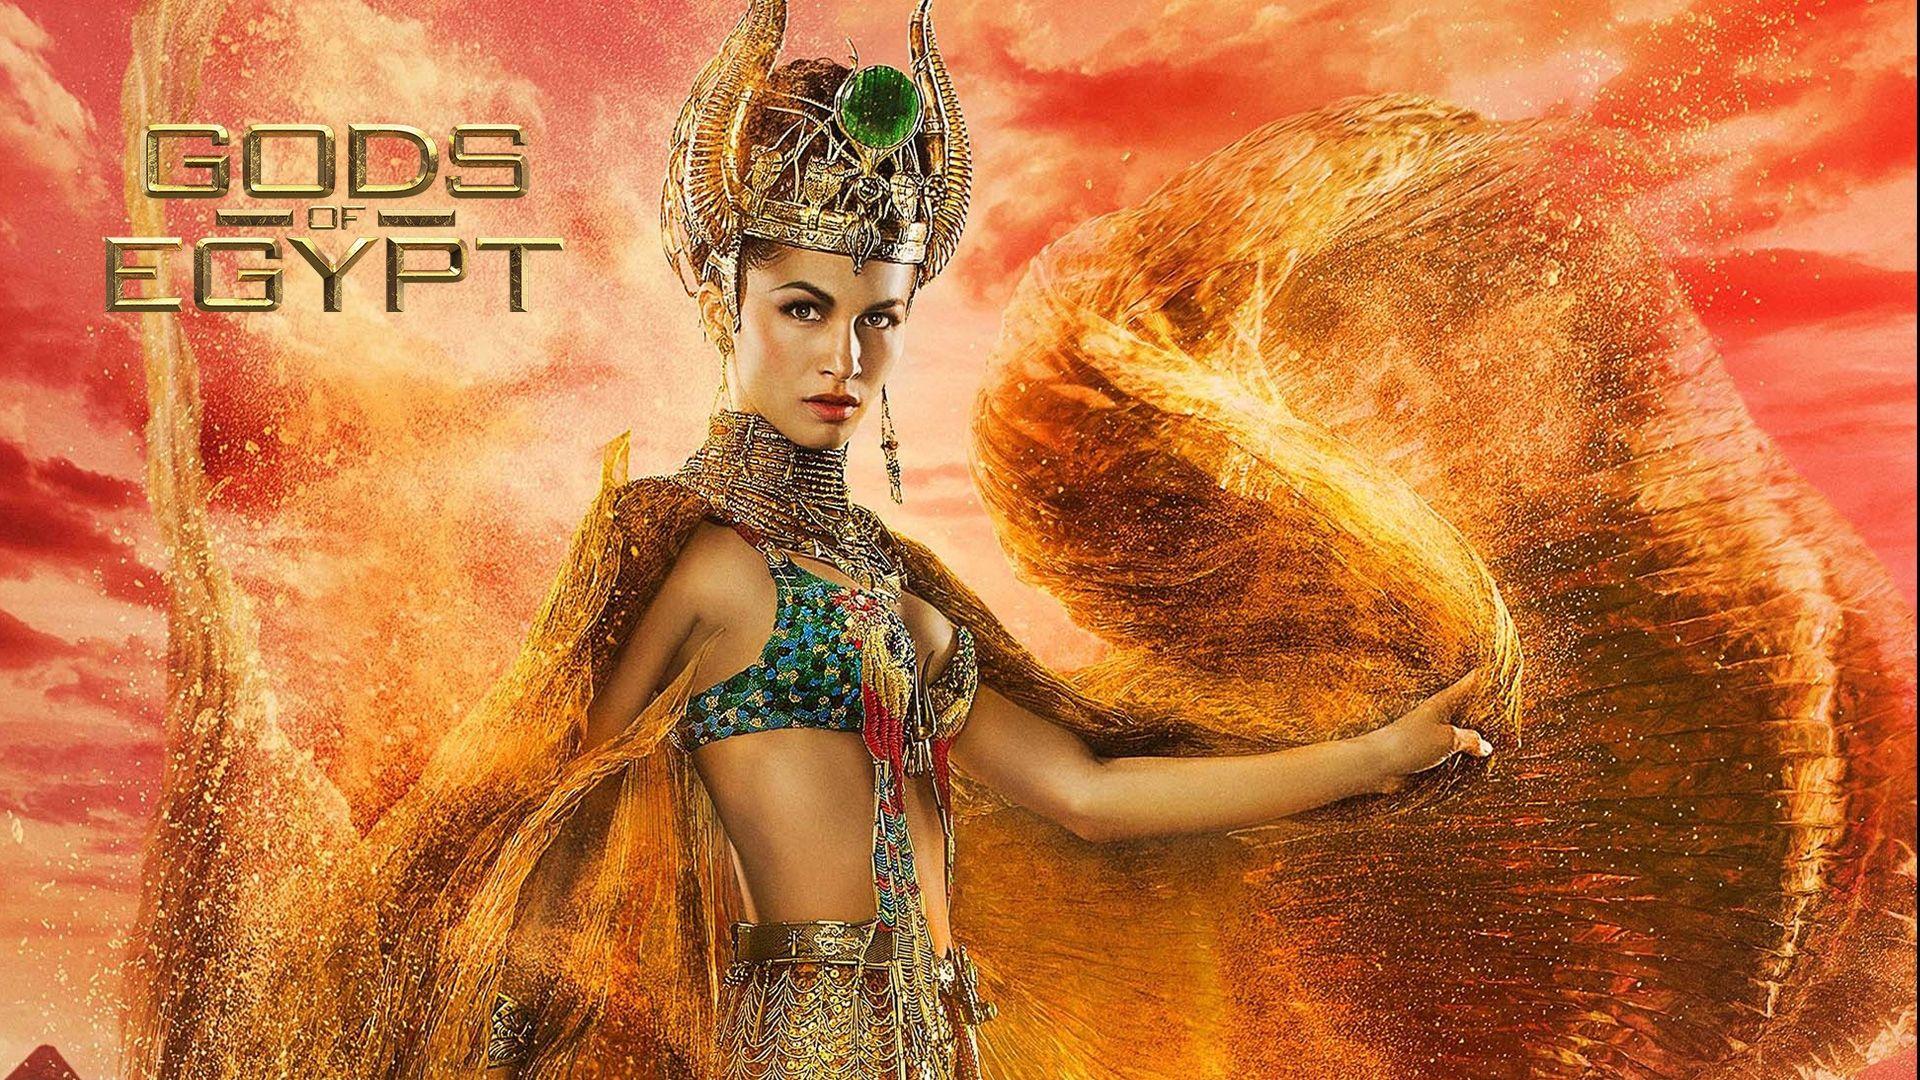 free wallpaper of love goddess download - wallpaper of love goddess